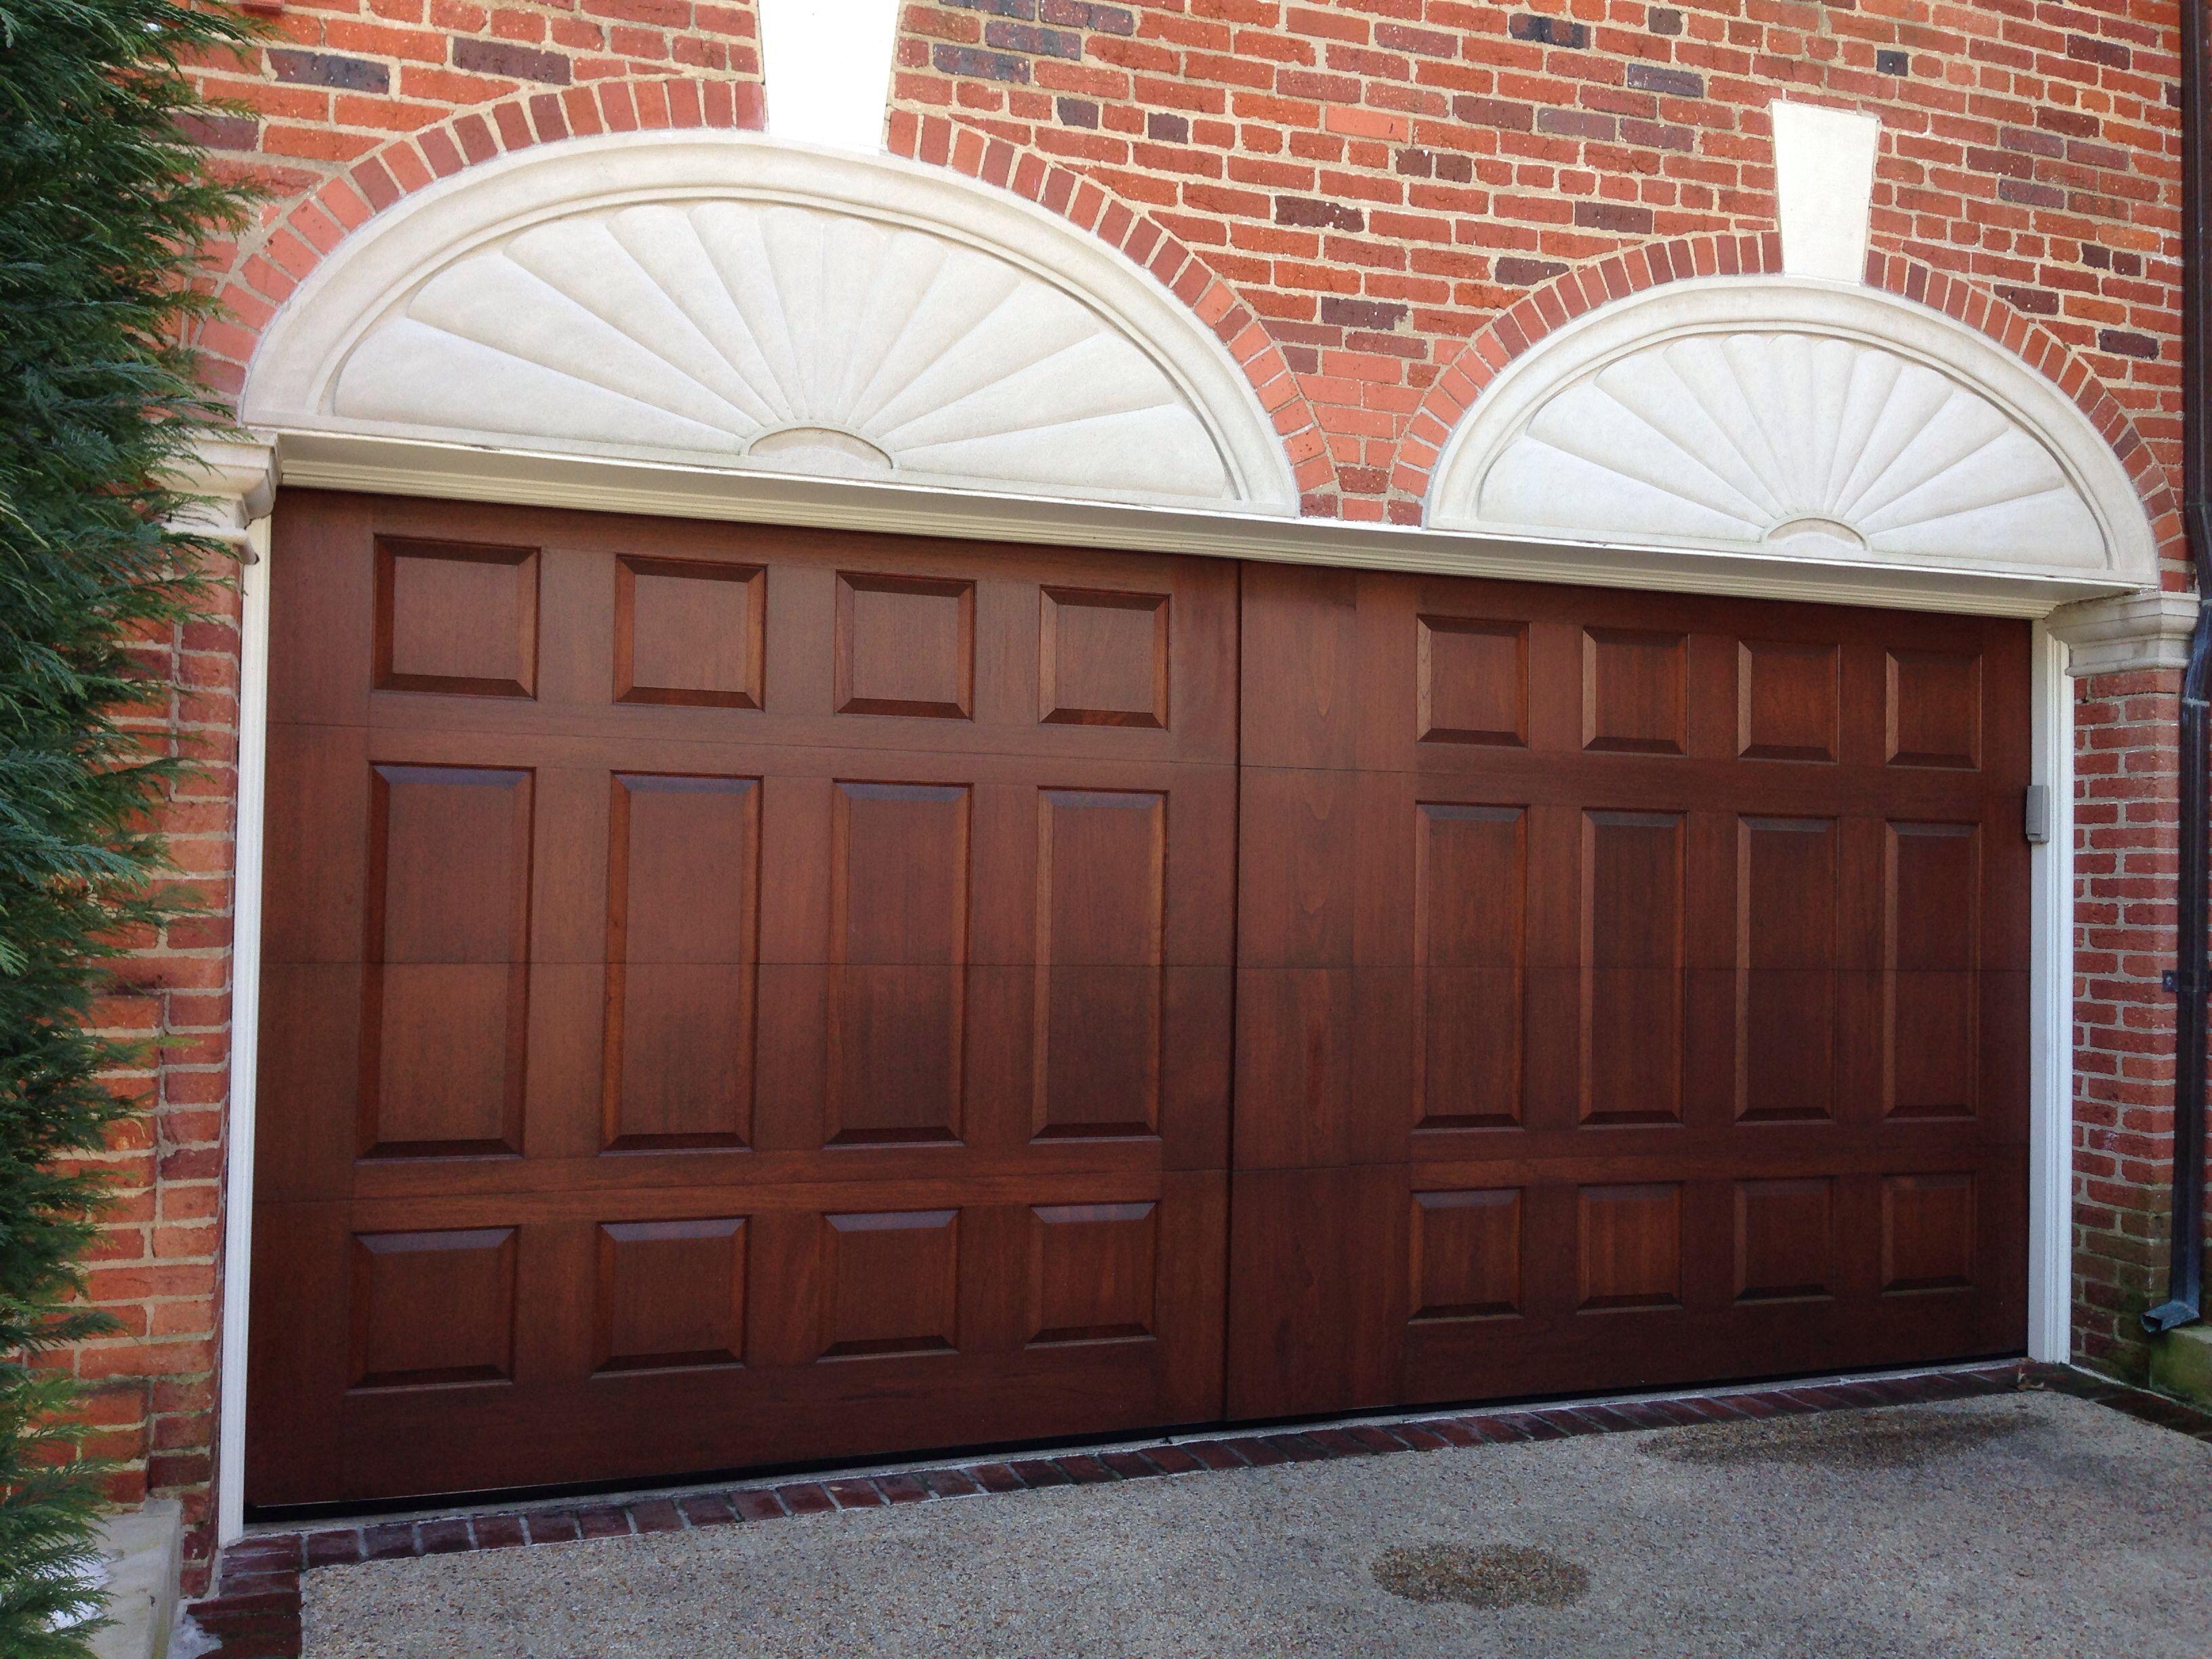 Beautiful raised panel Clear Spanish Cedar wood garage door with wide false center post built into & Beautiful raised panel Clear Spanish Cedar wood garage door with ... pezcame.com